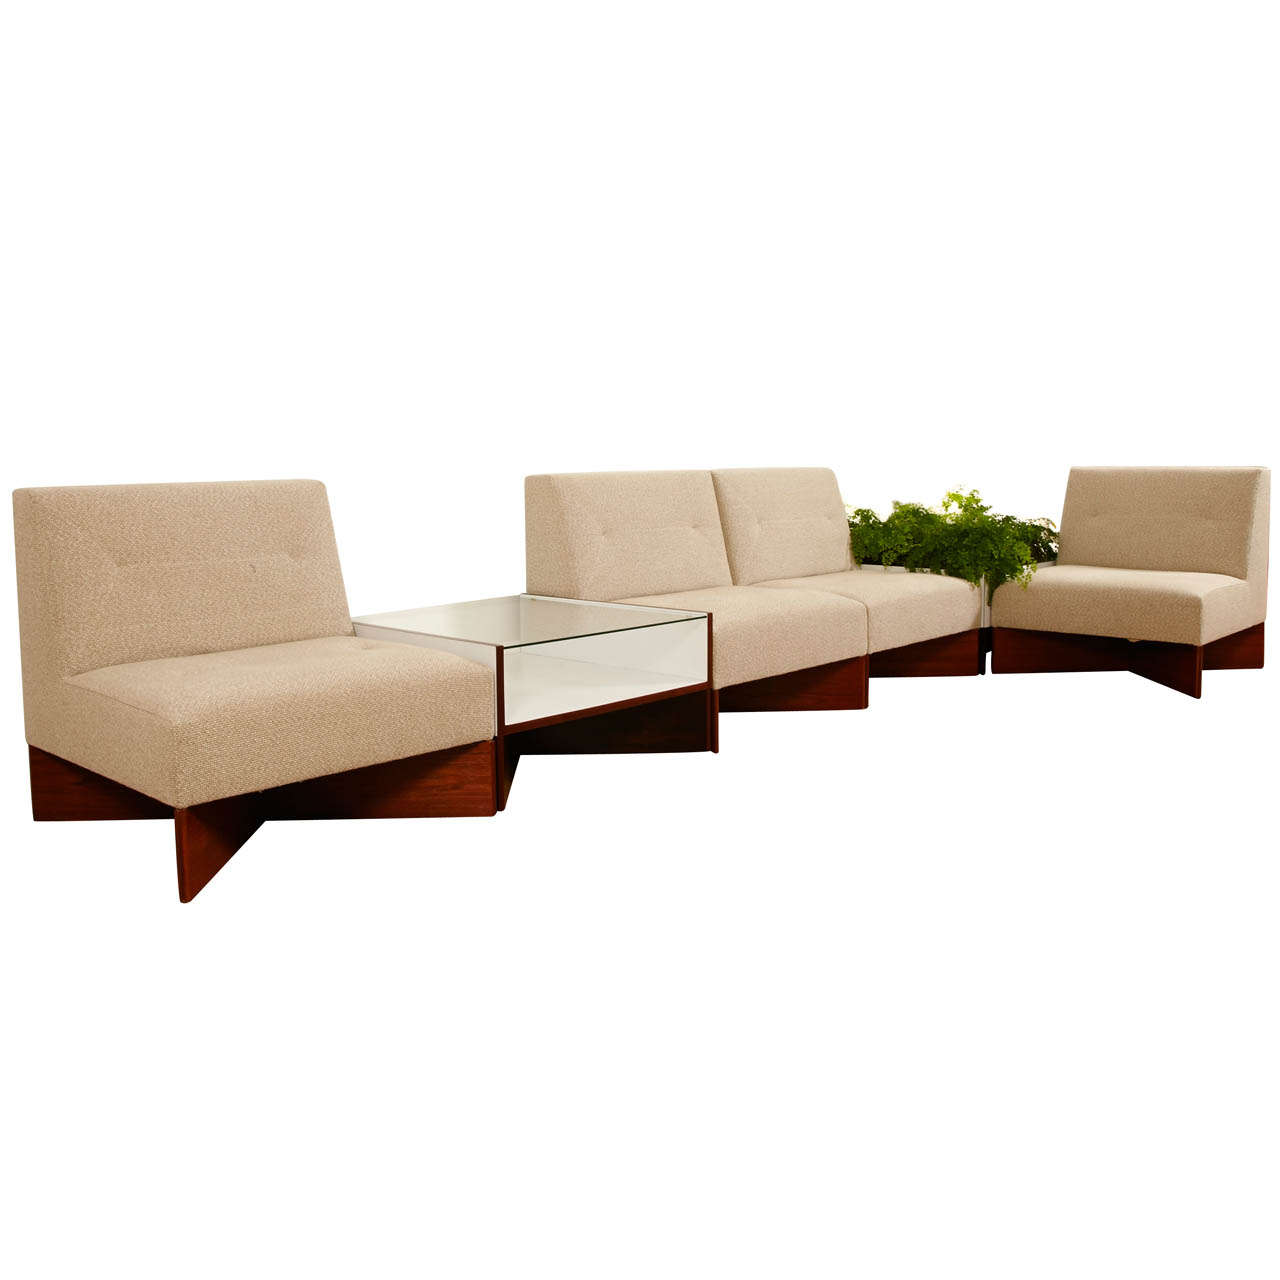 1960s Living Room Furniture